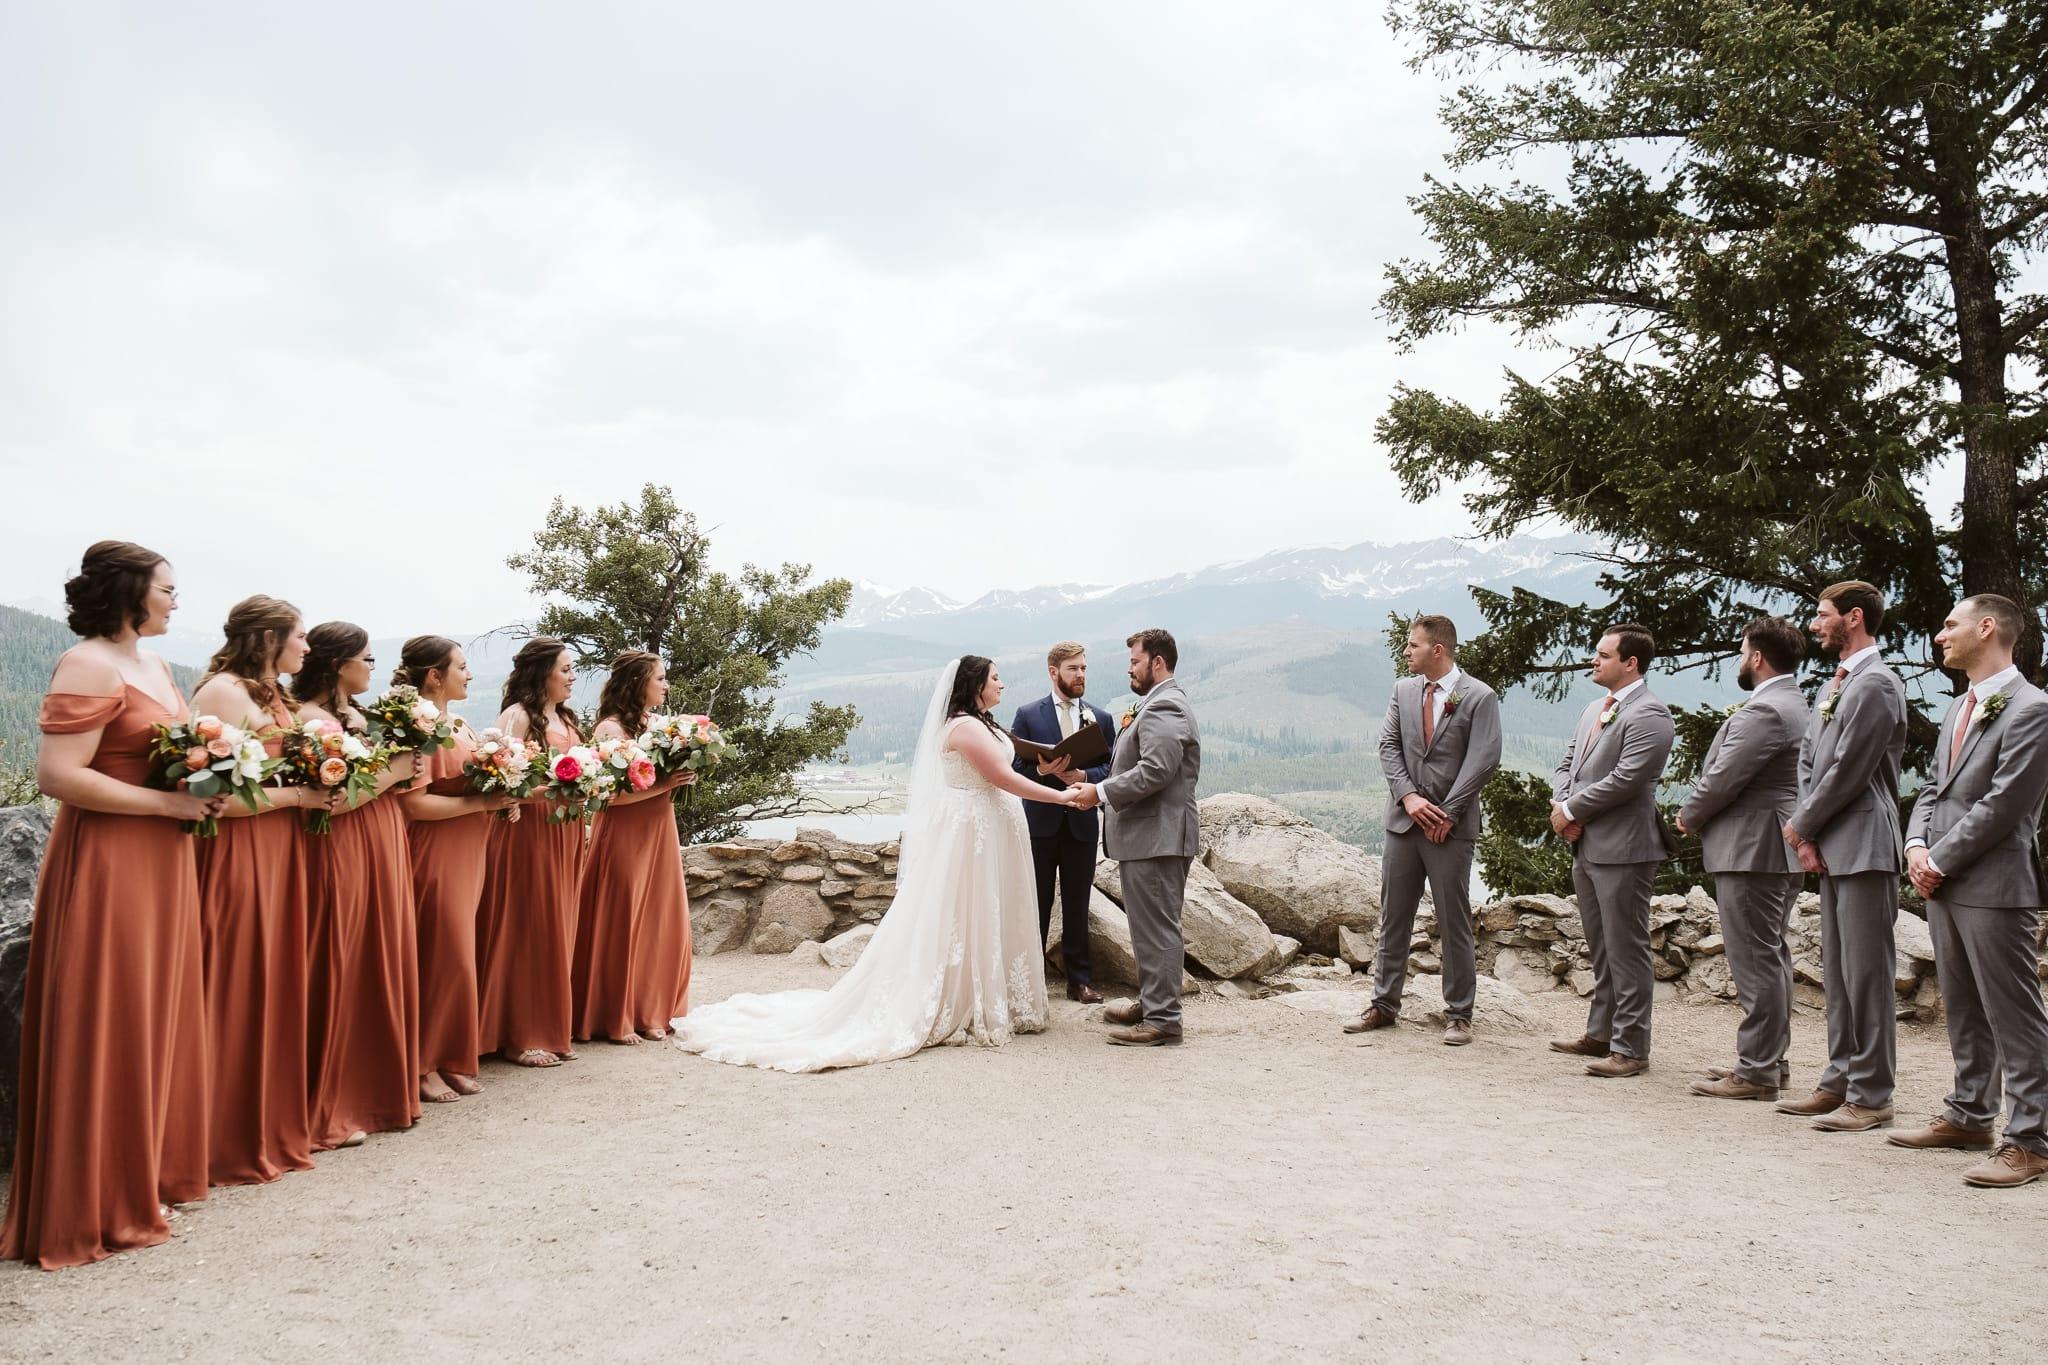 Sapphire Point Overlook wedding venue